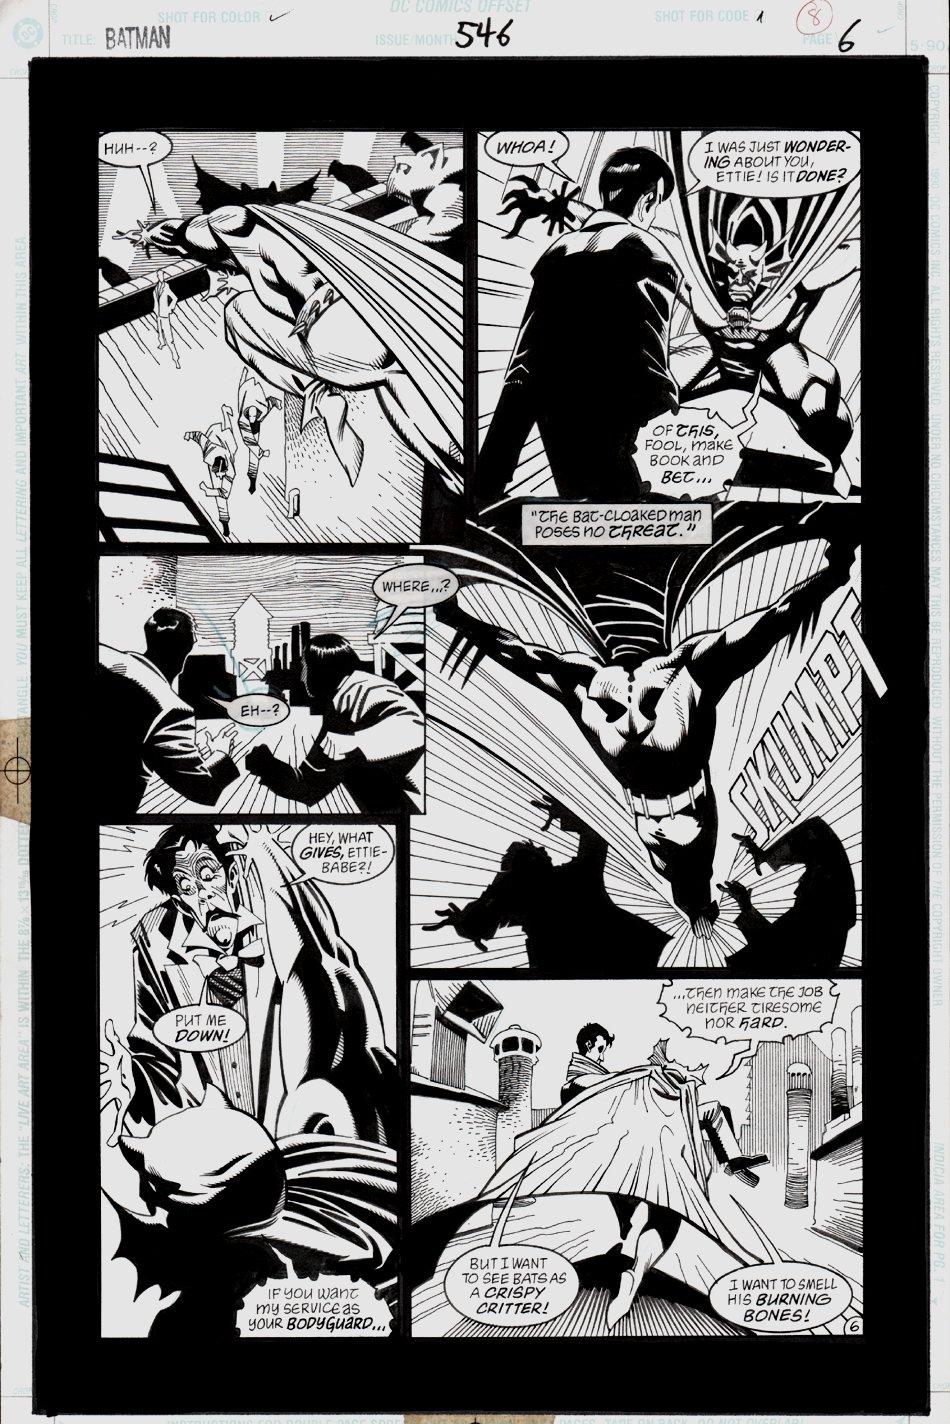 Batman #546 p 6 (BATMAN, THE JOKER, THE DEMON!) 1997